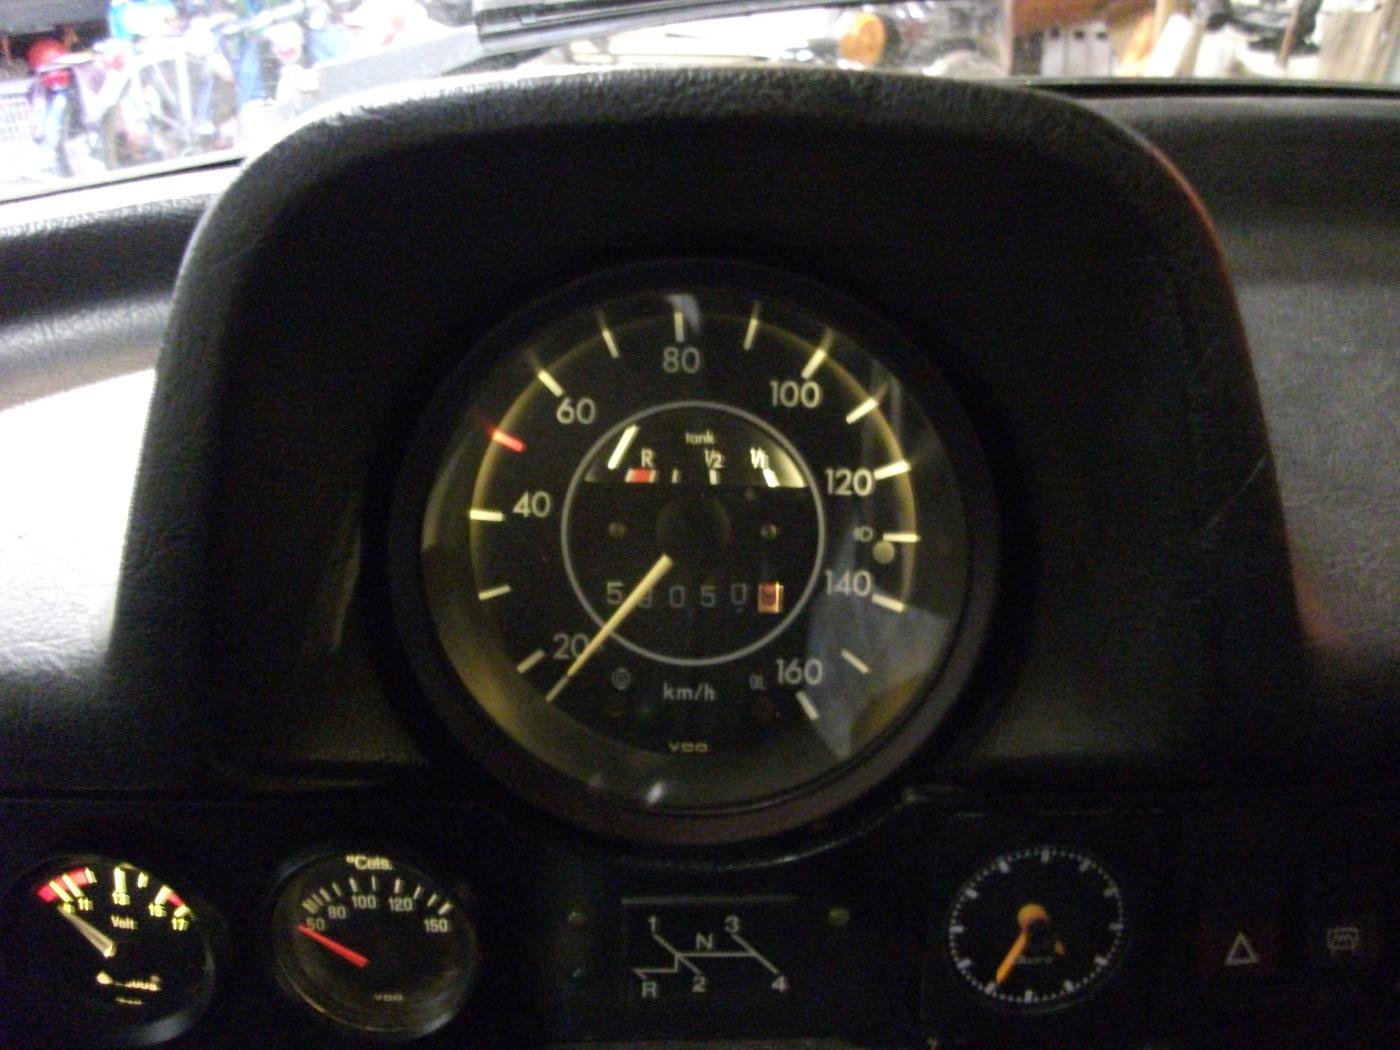 LED in VW speedometer installed